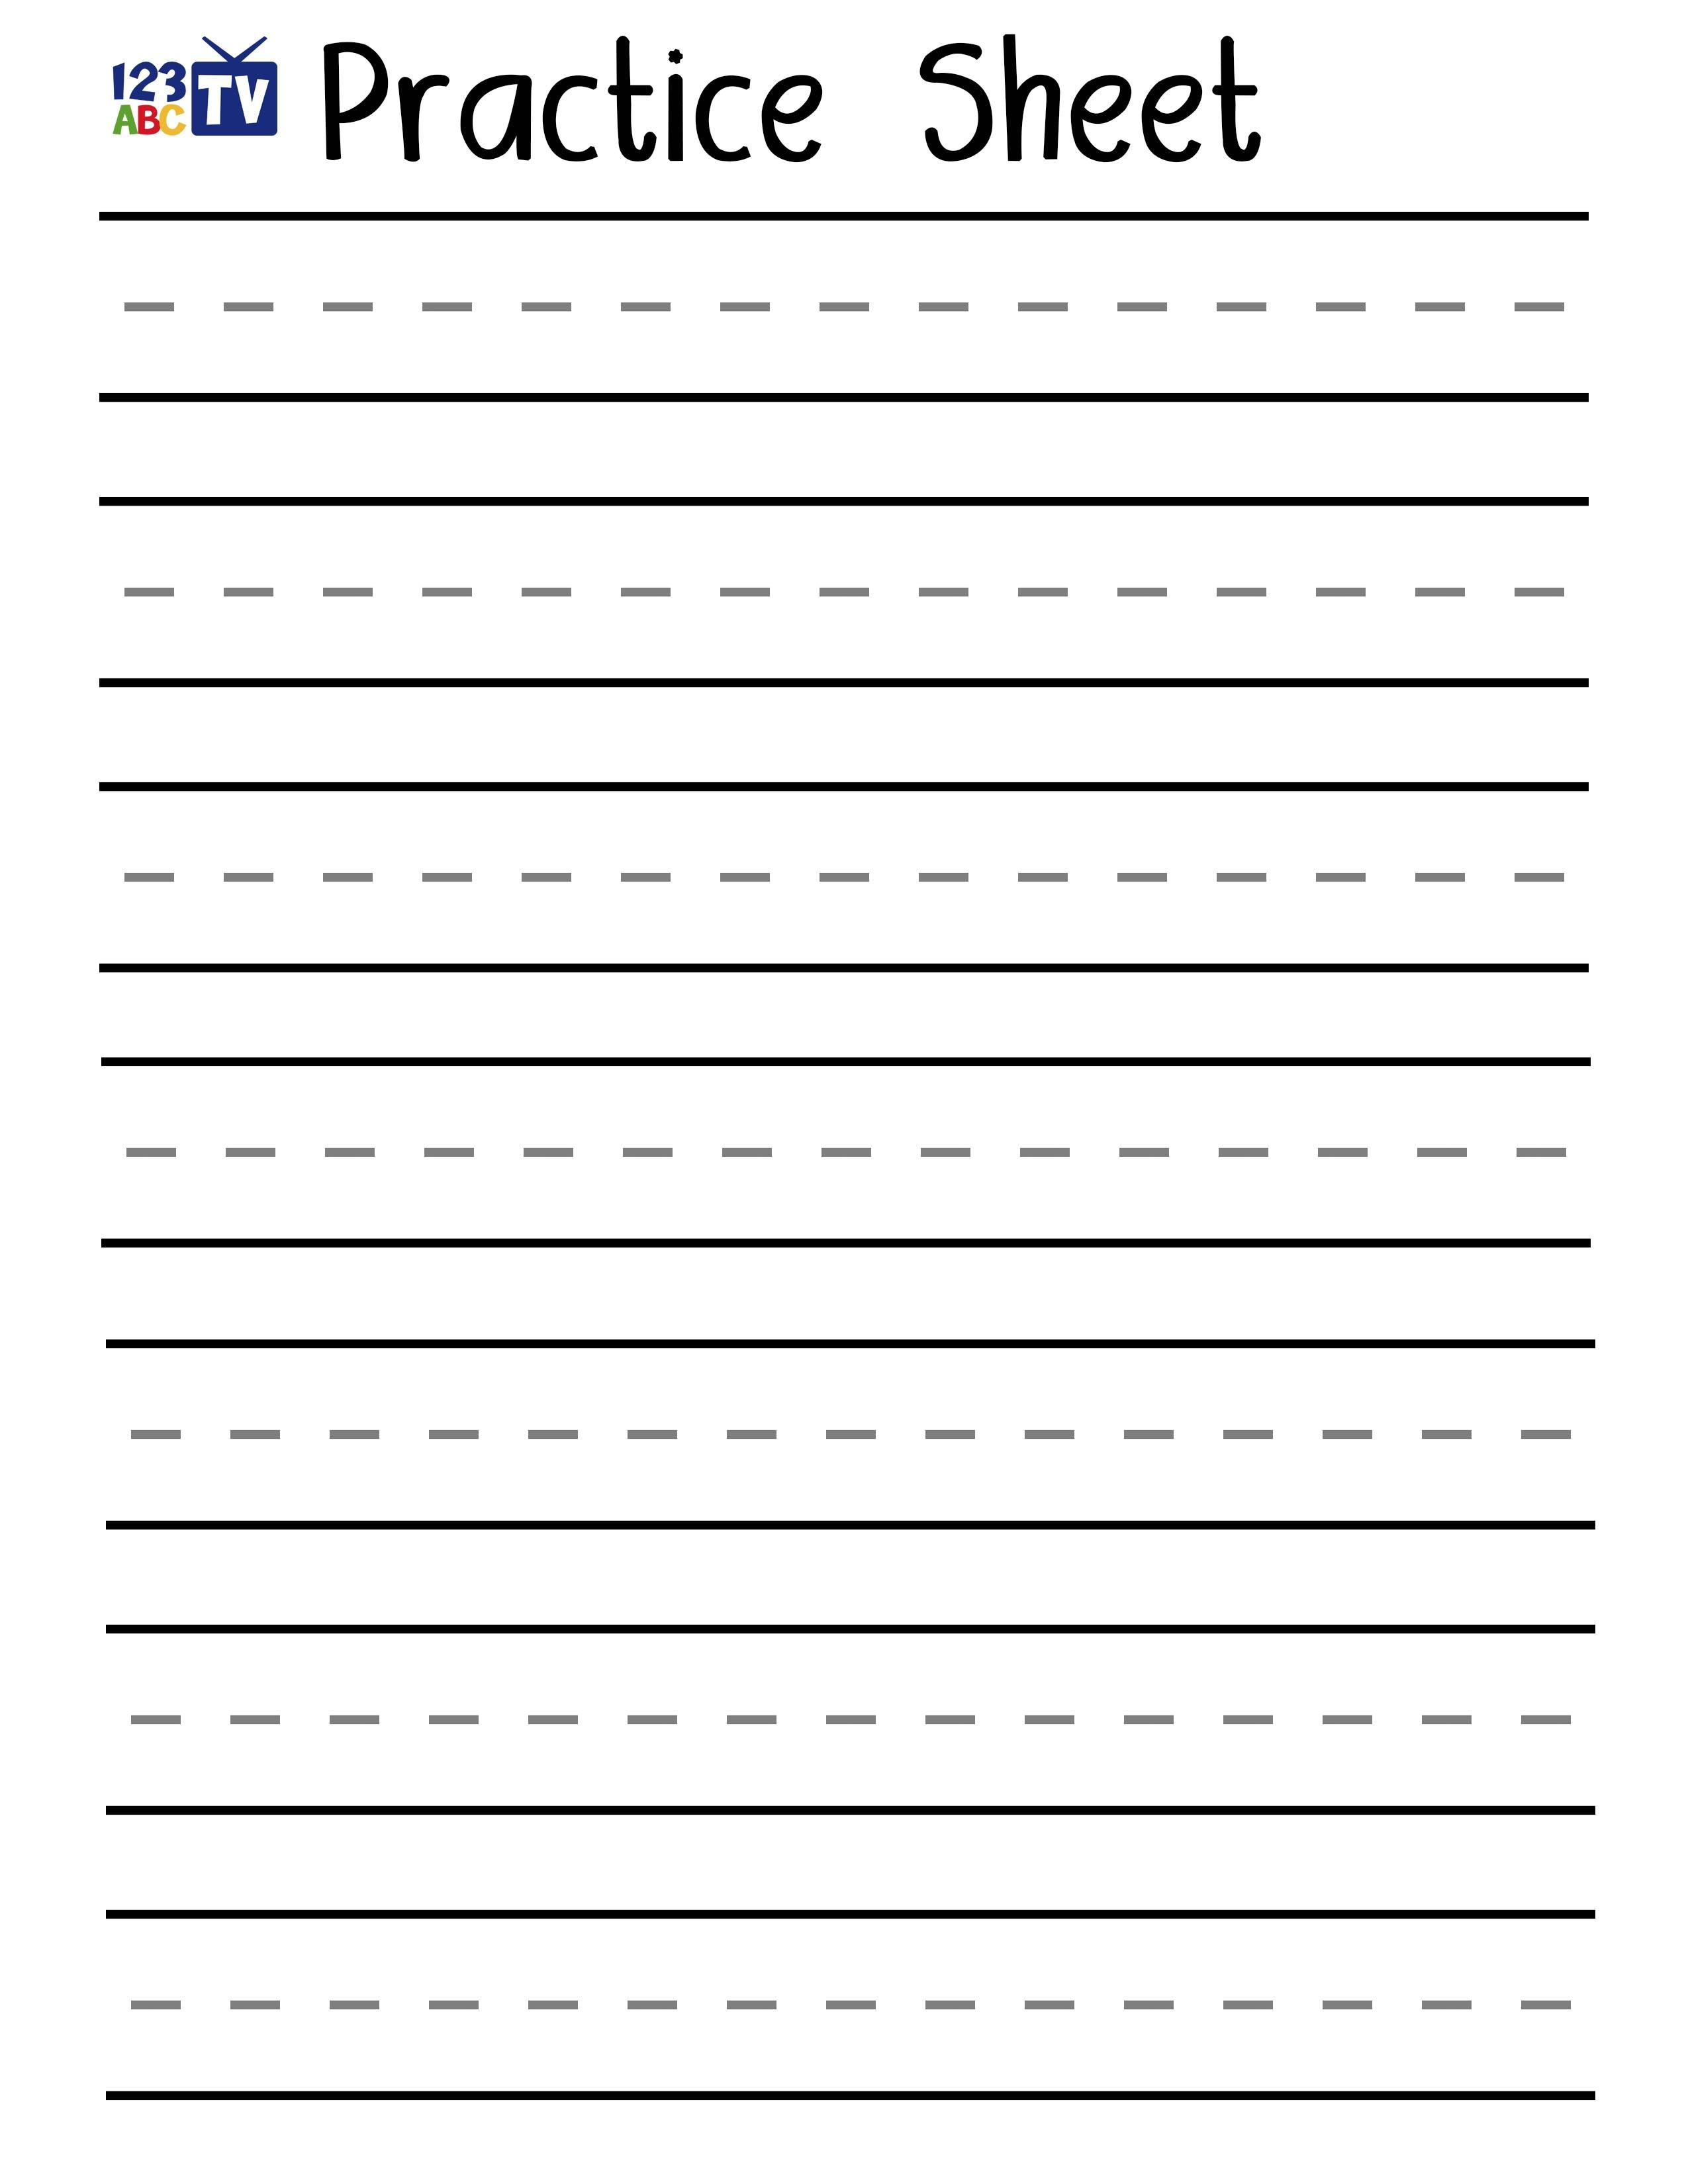 Blank Handwriting Worksheets Pdf Awesome Print Handwriting - Free Printable Blank Handwriting Worksheets